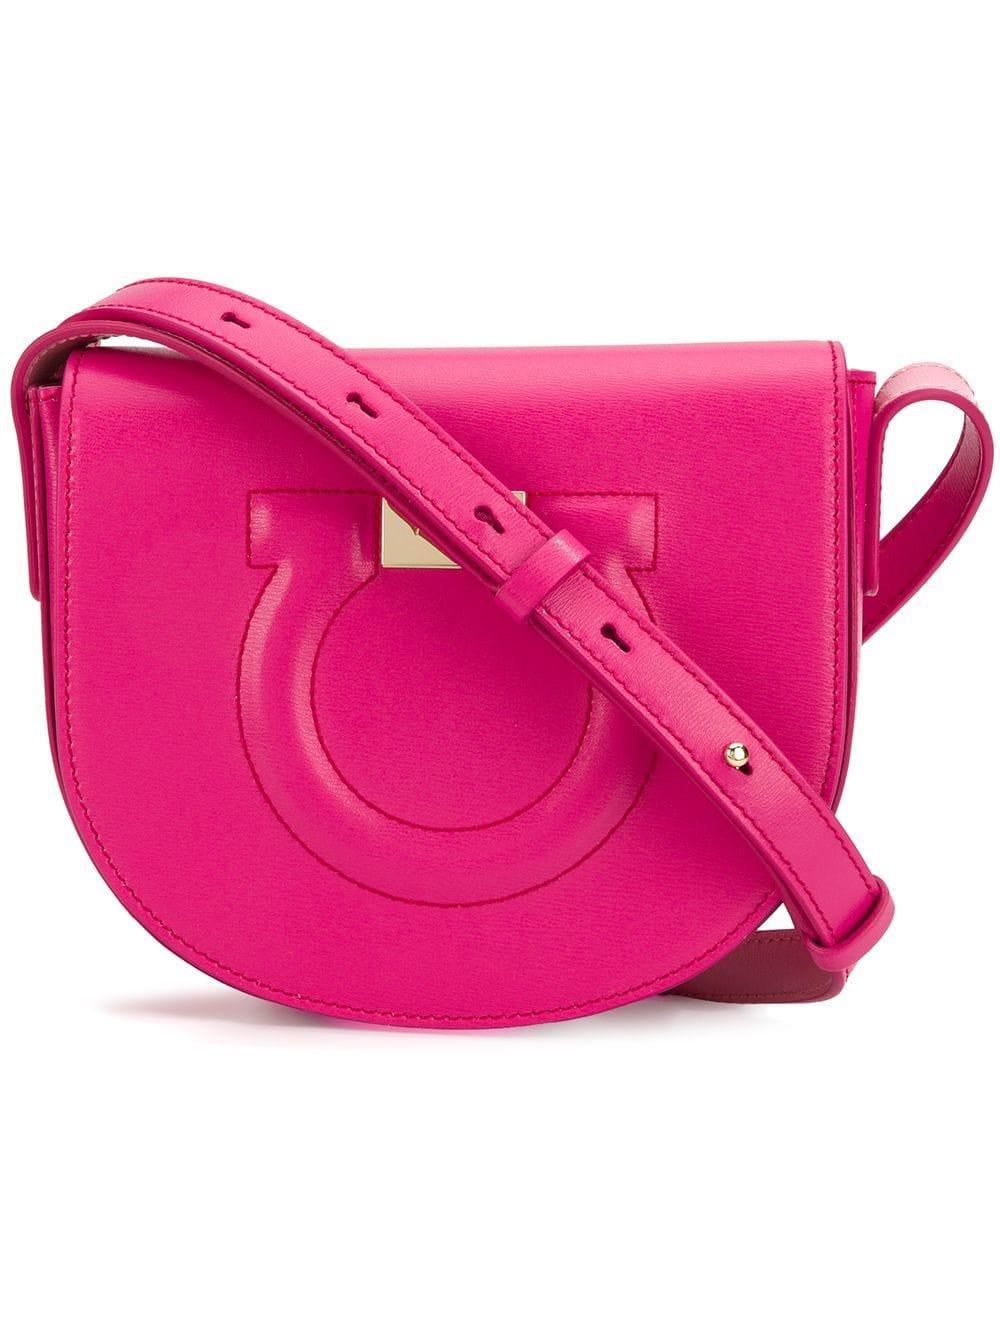 418ec0fb78e9 Lyst - Ferragamo Gancio City Leather Shoulder Bag in Purple